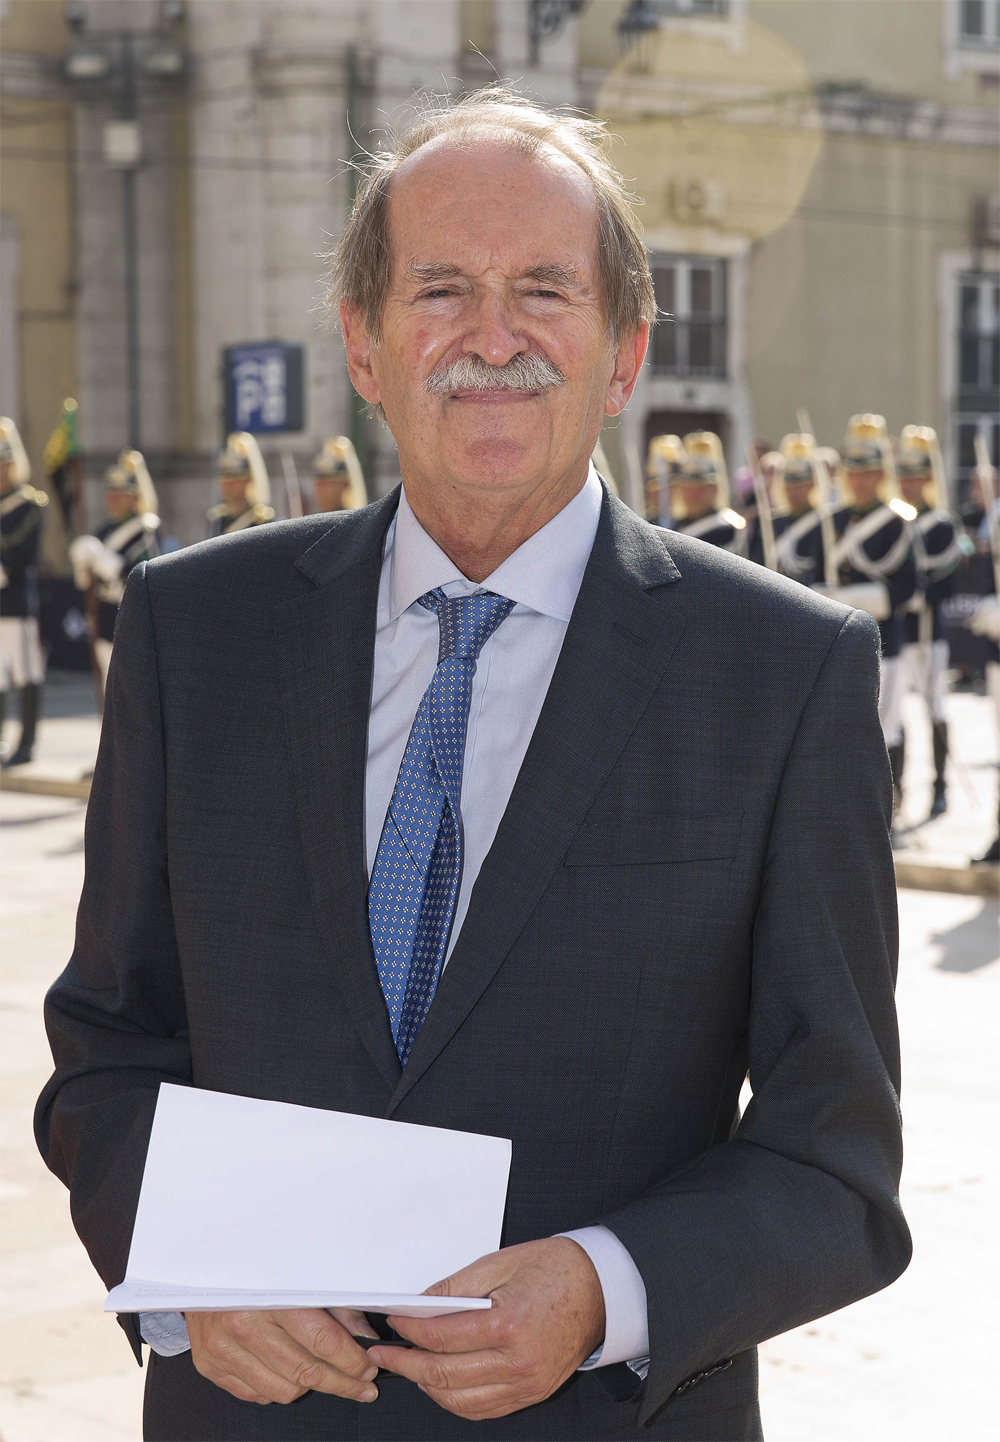 Дуарте Пиу, герцог Браганса.